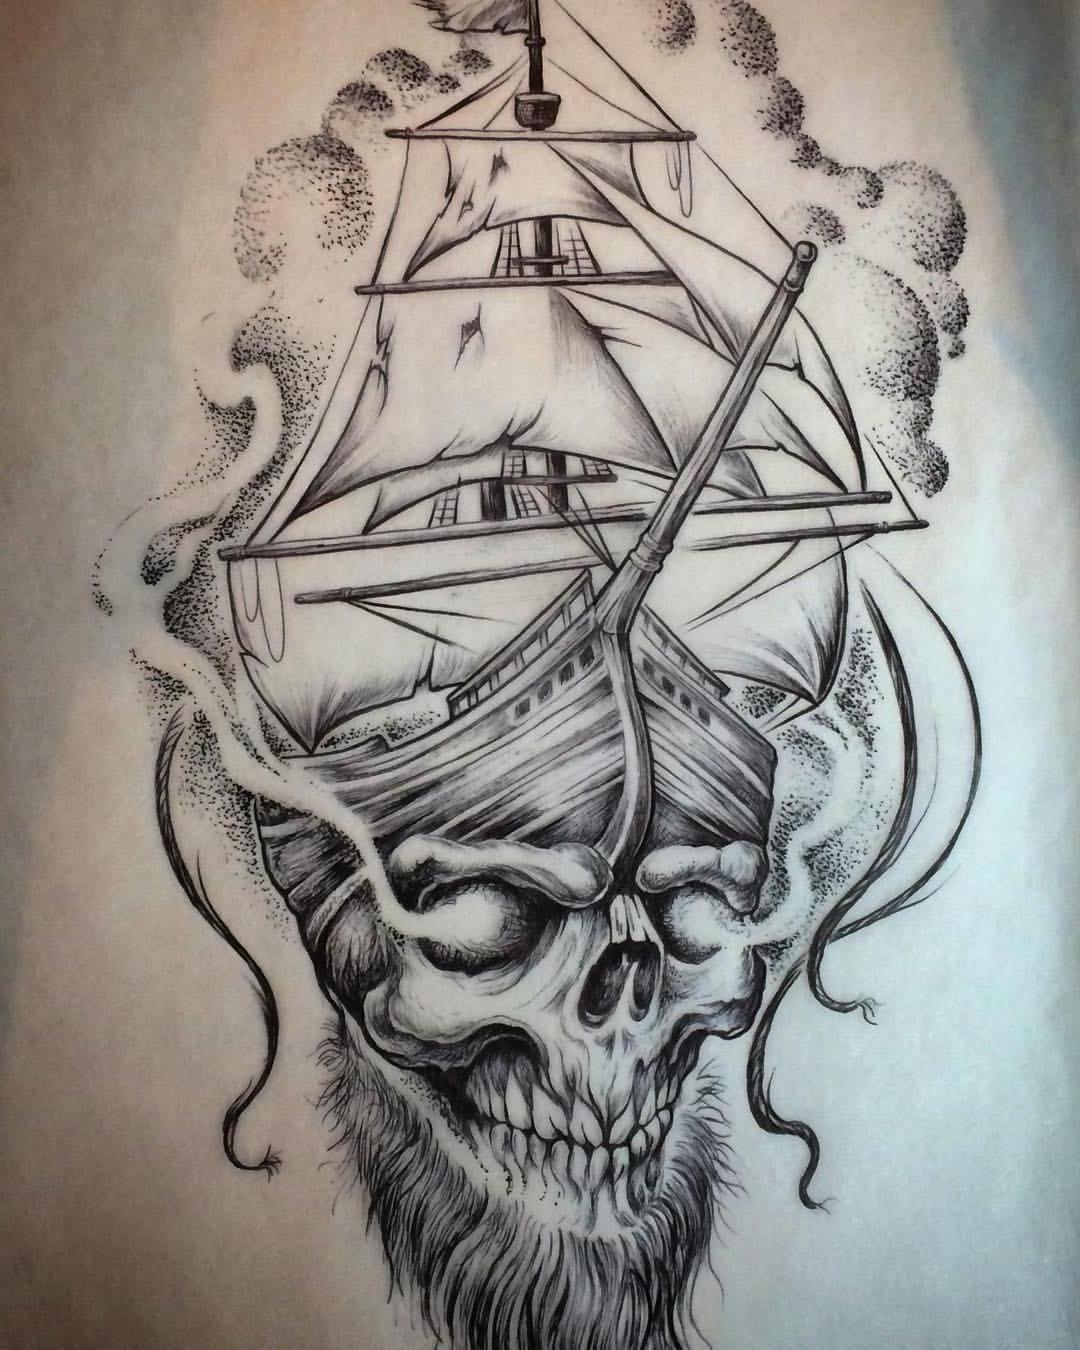 Ship Tattoo Drawing at GetDrawings | Free download